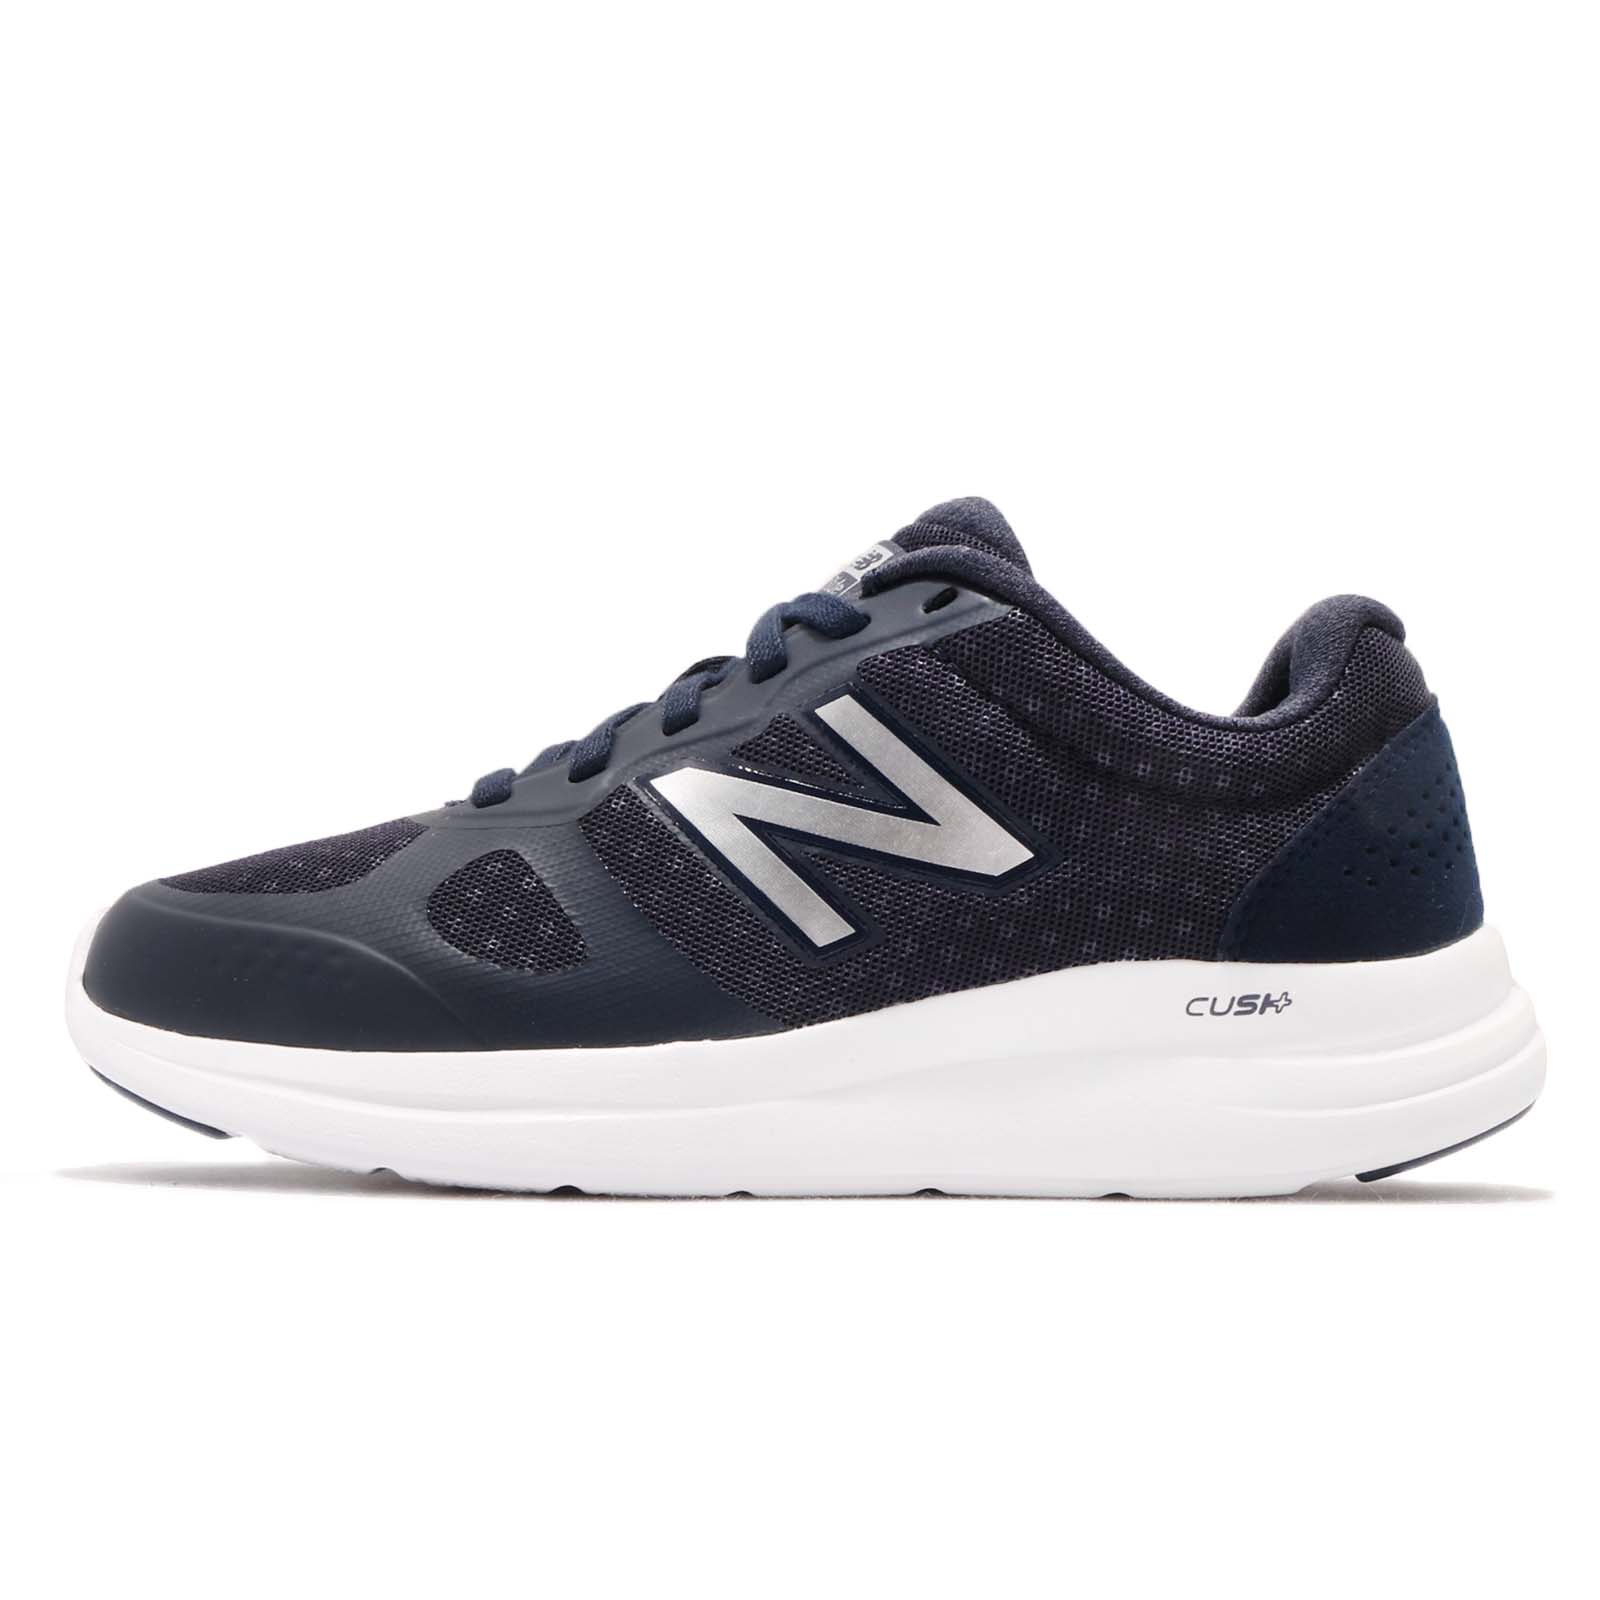 New Balance 慢跑鞋 Versi 寬楦頭 女 深藍 緩震 休閒 運動鞋 NB 【ACS】 WVERSLJ1 D